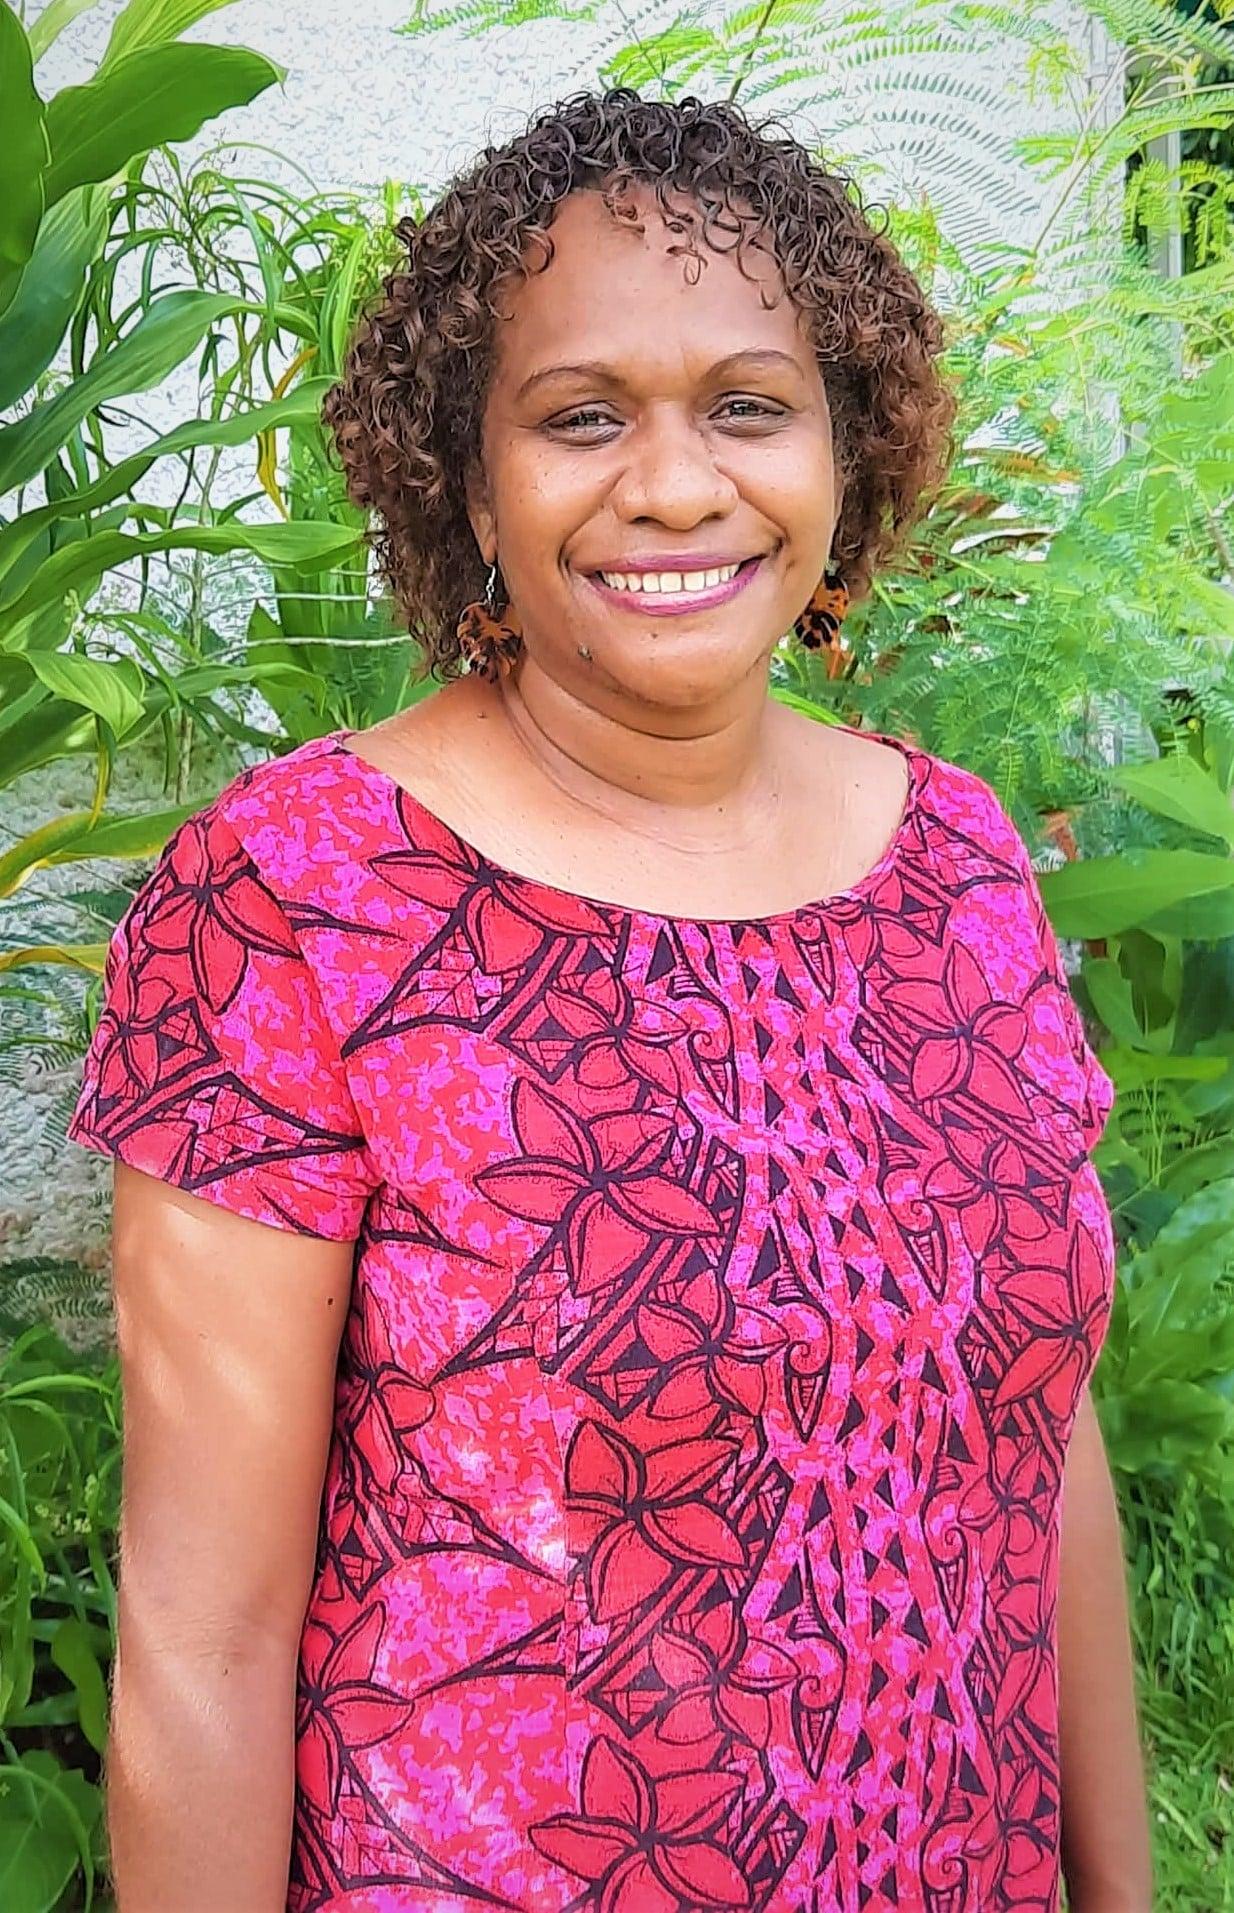 vanuatu-womens-center-appoints-new-coordinator